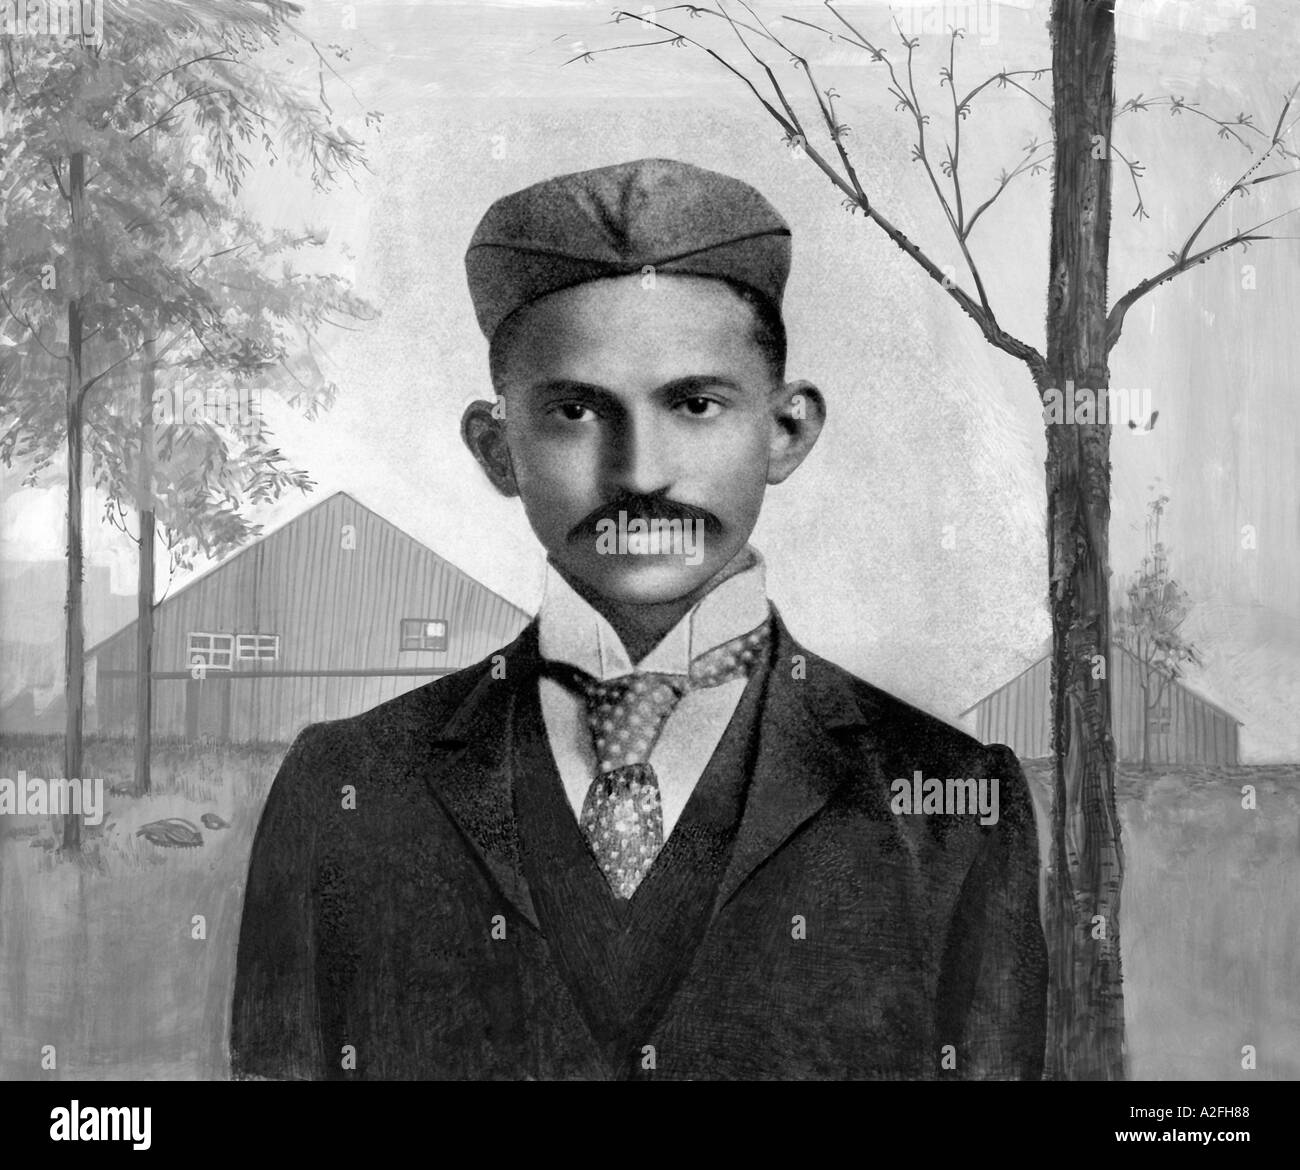 Il Mahatma Gandhi in Sud Africa 1895 inizio foto di tie coat hat Immagini Stock